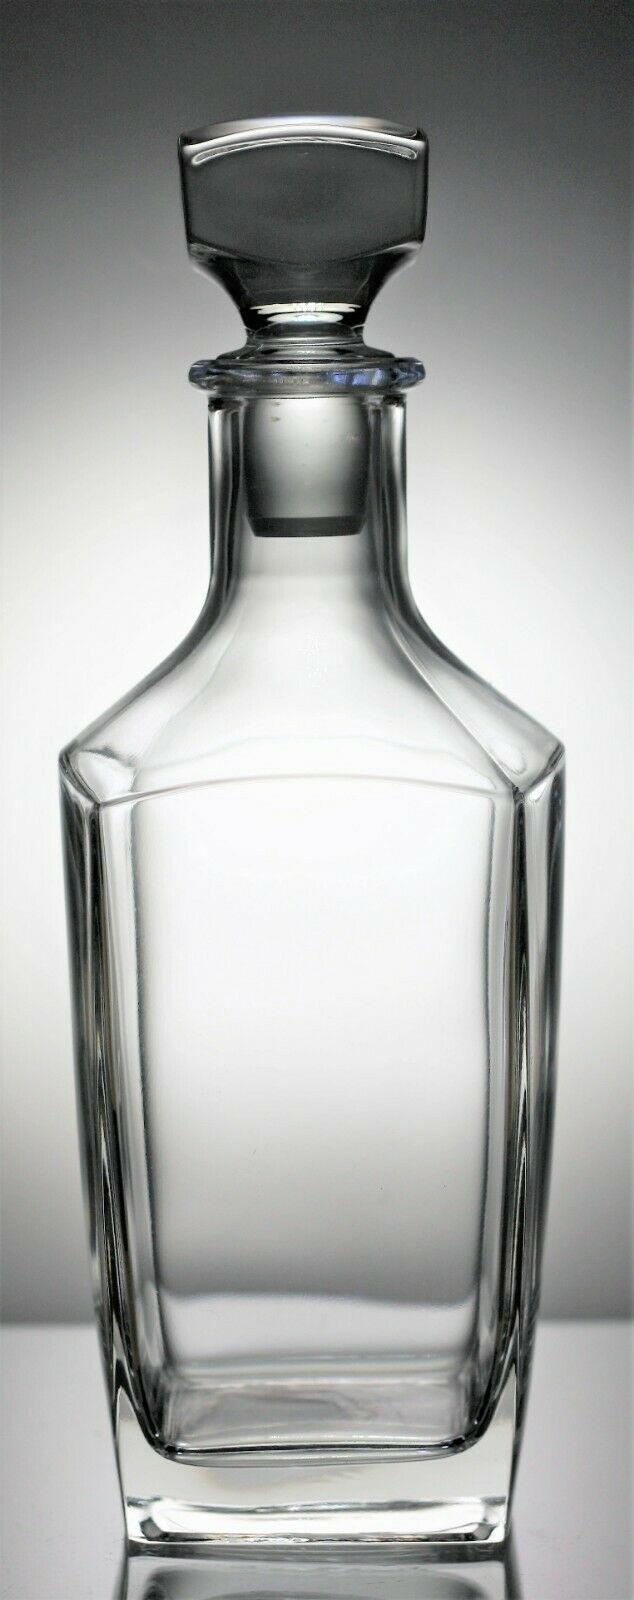 Lot 142 - Hand Blown Contemporary Crystal Glass Spirit Decanter